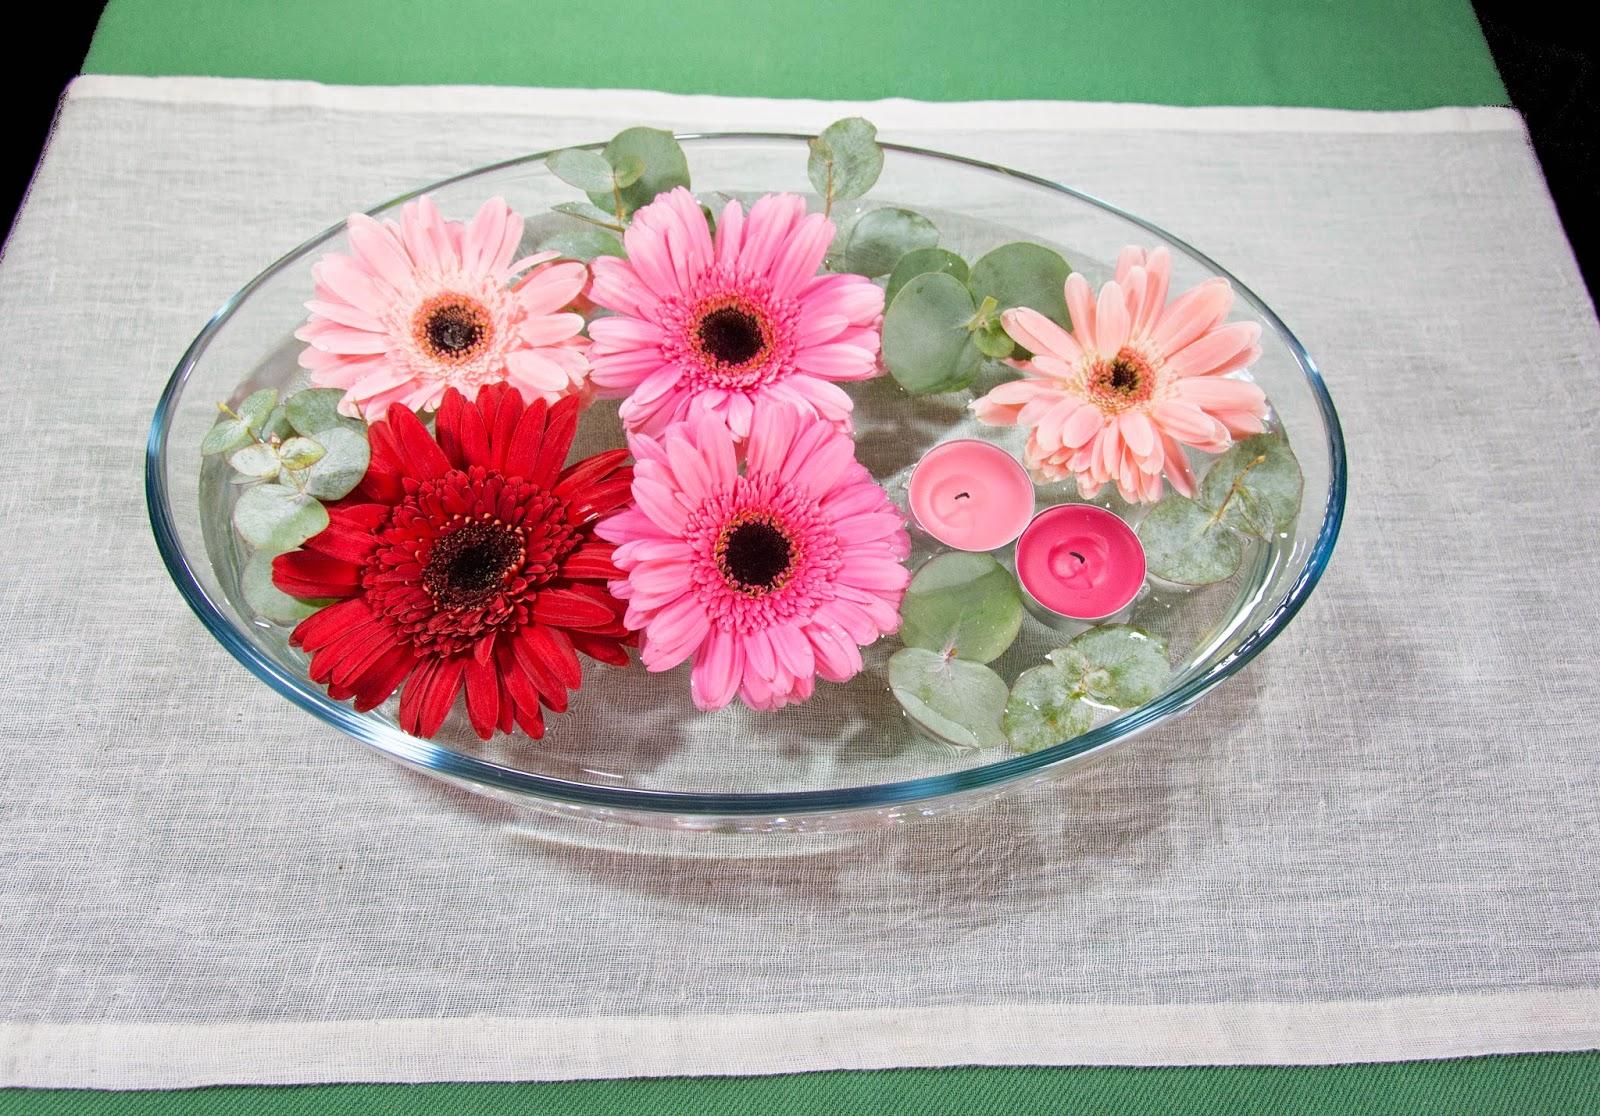 Imagenes De Centros De Mesa Con Flores Naturales - Arreglos Florales para Centro de Mesa, Centros de Mesa